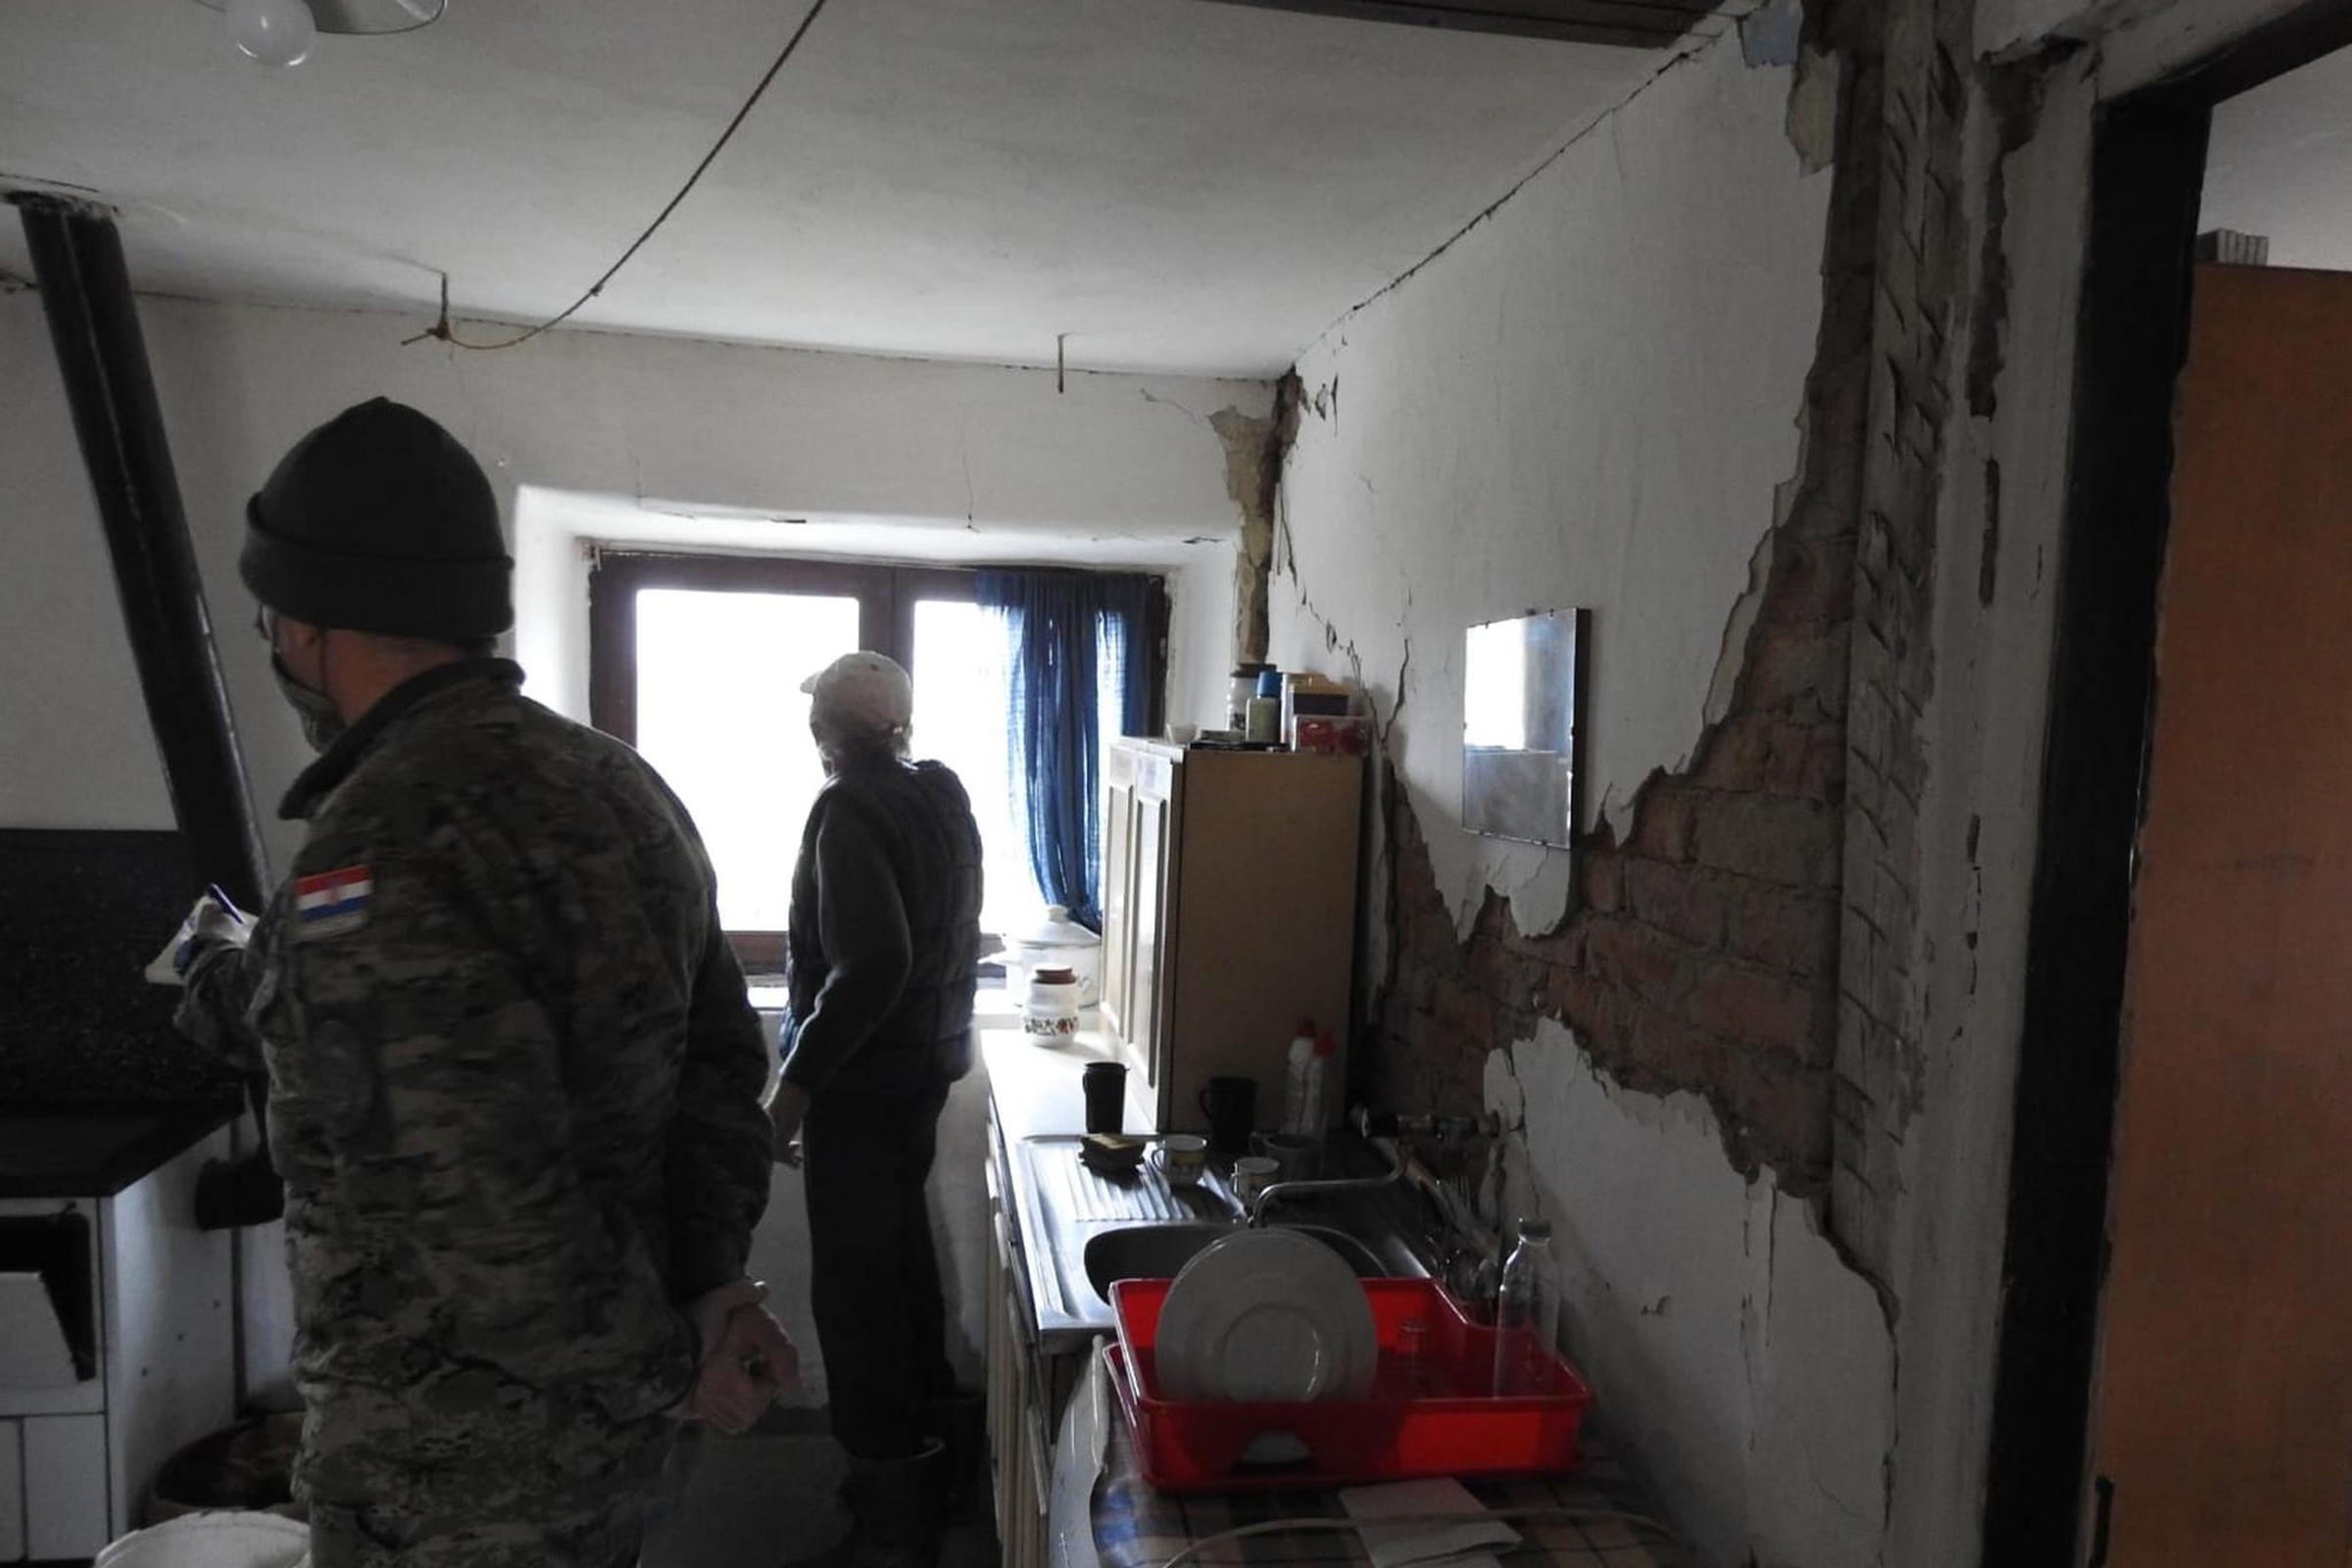 Mobilni timovi Hrvatske vojske obilaze stanovnike Sisačko-moslavačke županije